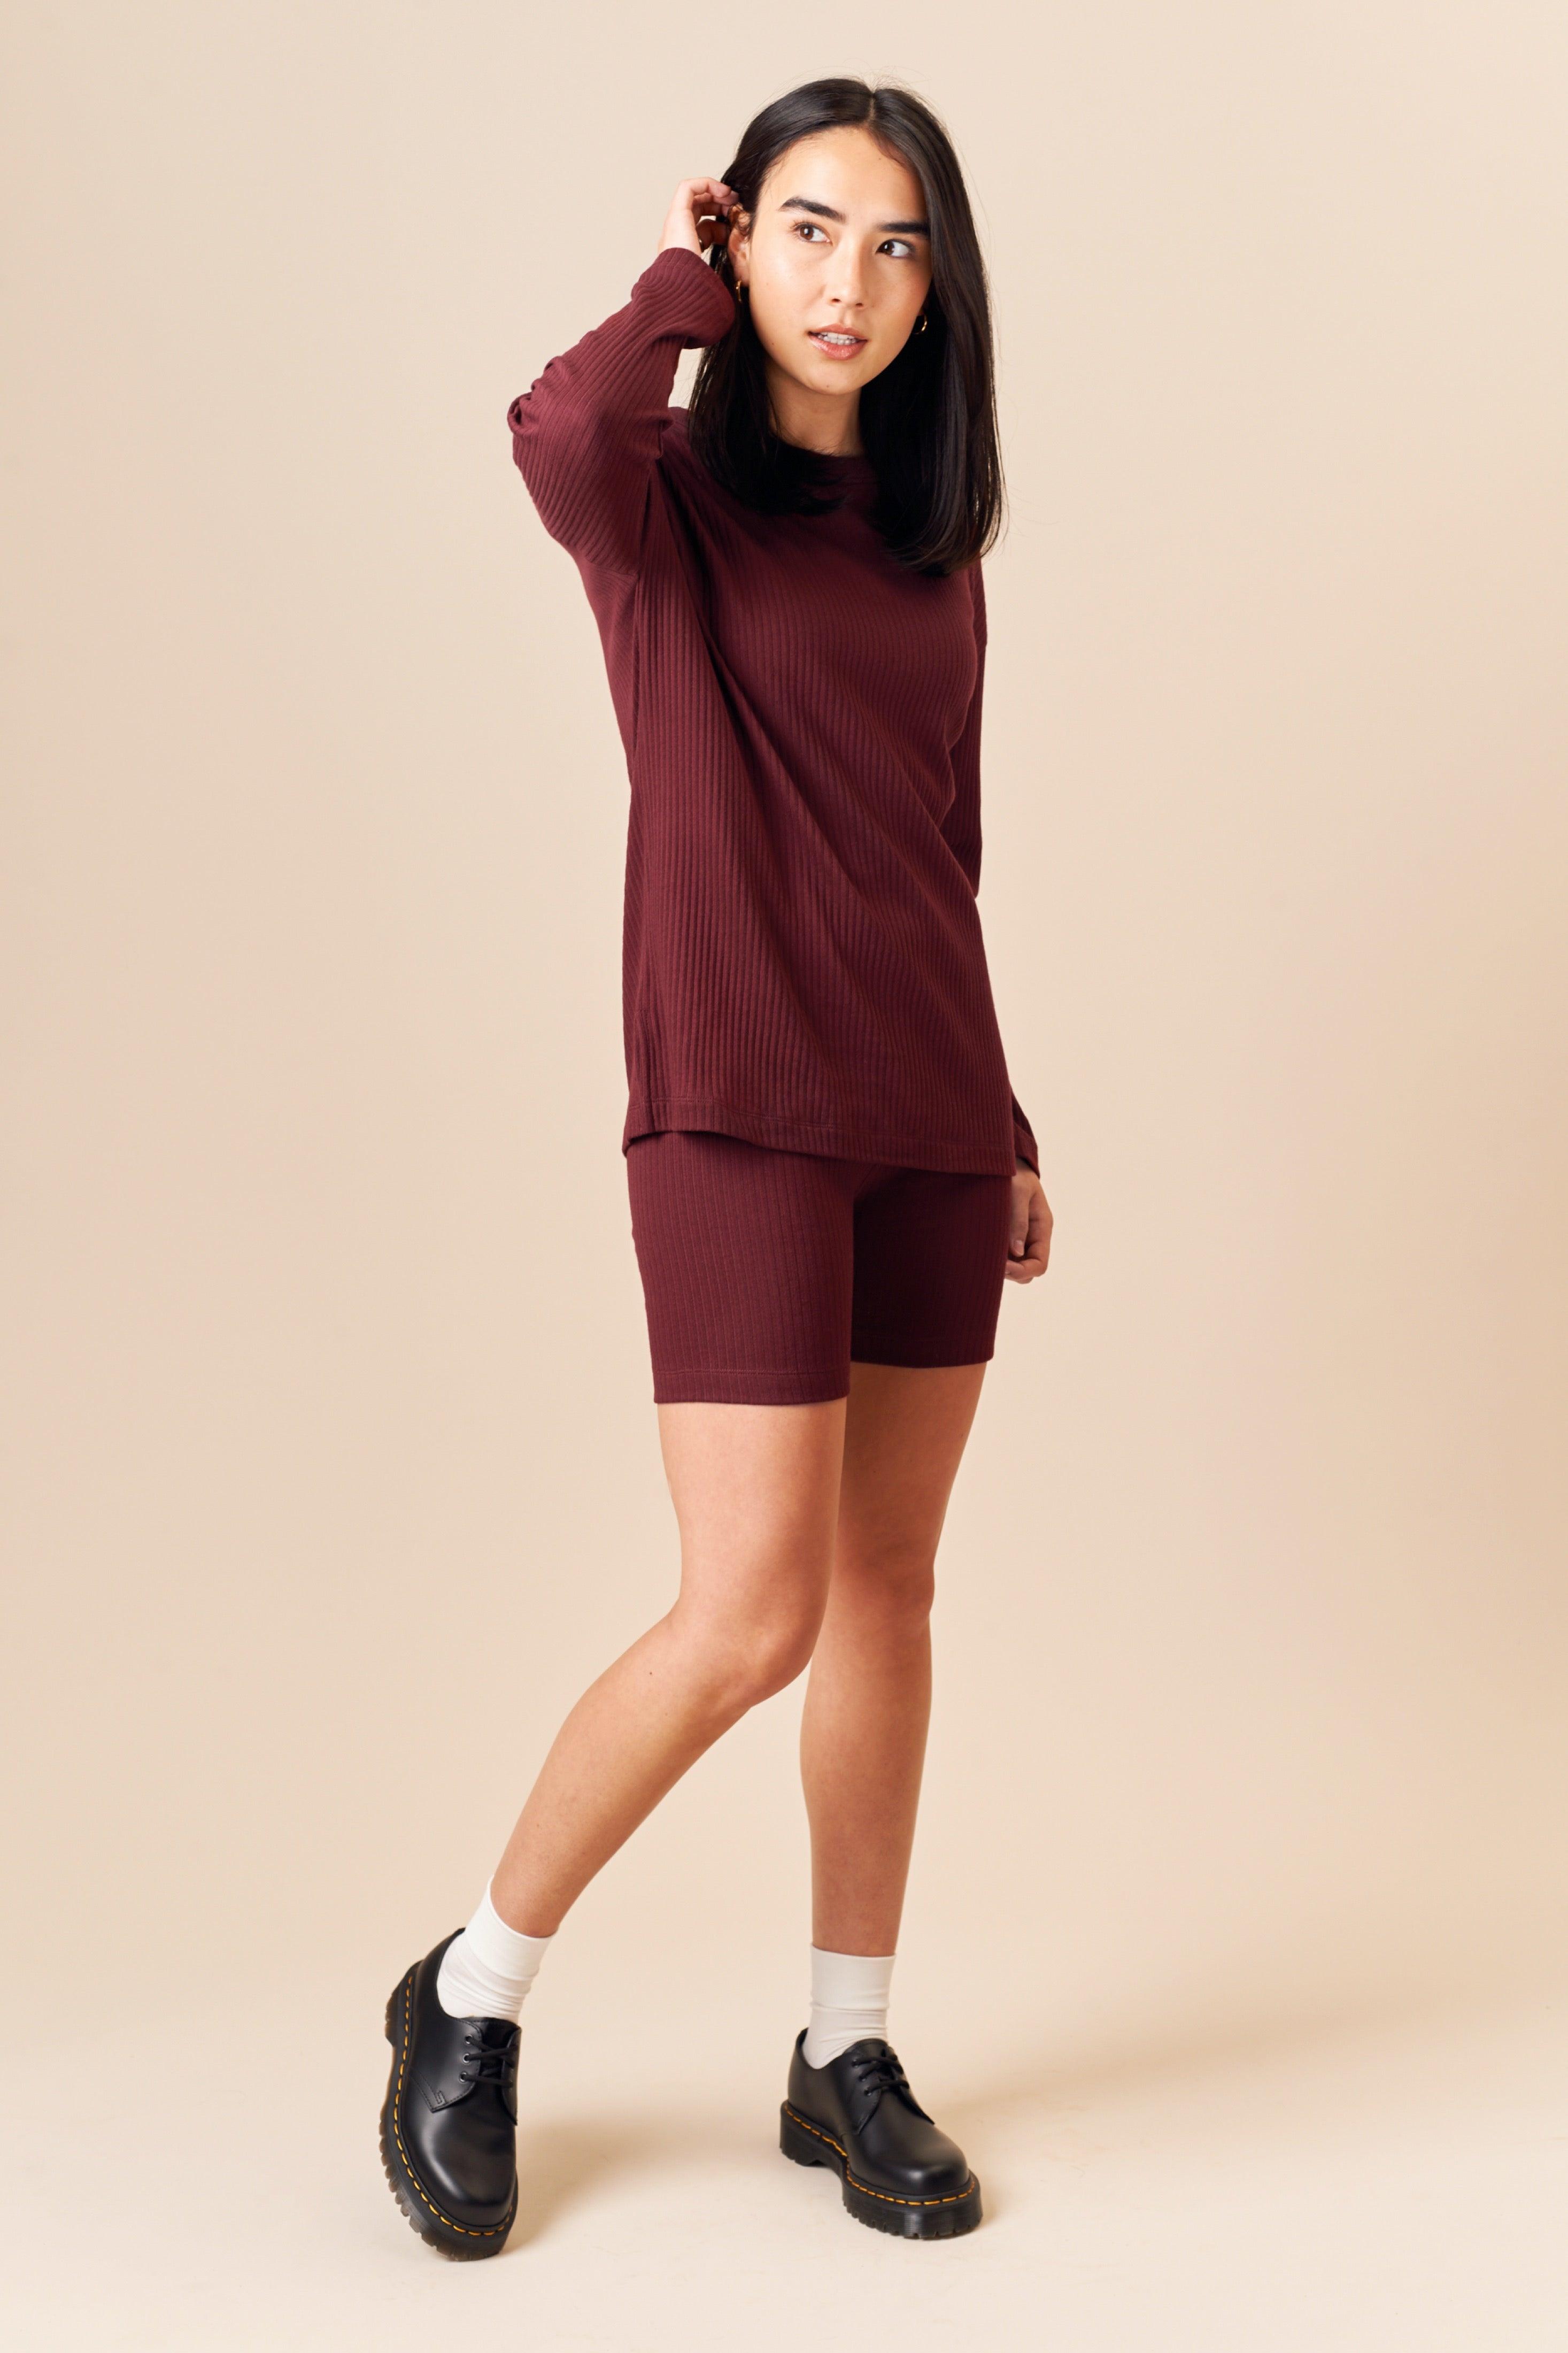 Kotn Women's Ribbed Shorts in Zinfandel, Size Large